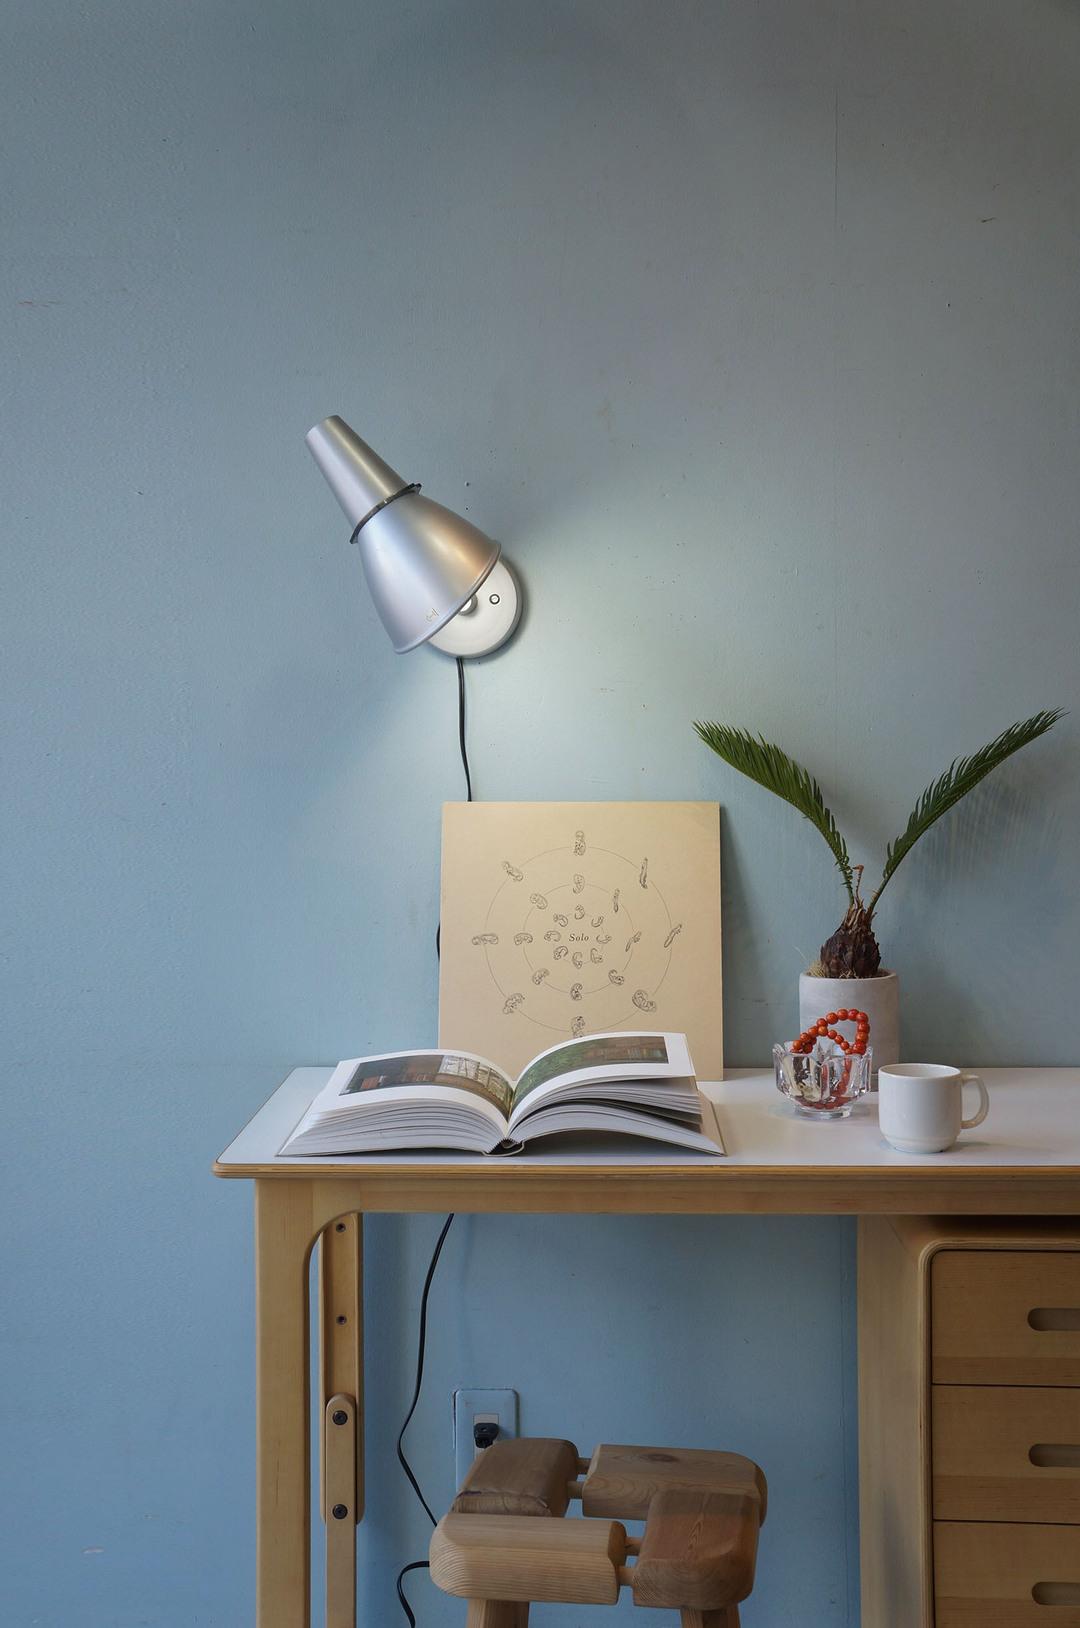 Artemide Wall Lamp SPY H.Wettstein/アルテミデ ウォールランプ スパイ ハンス・ウェッツスタイン 照明 インテリア 1